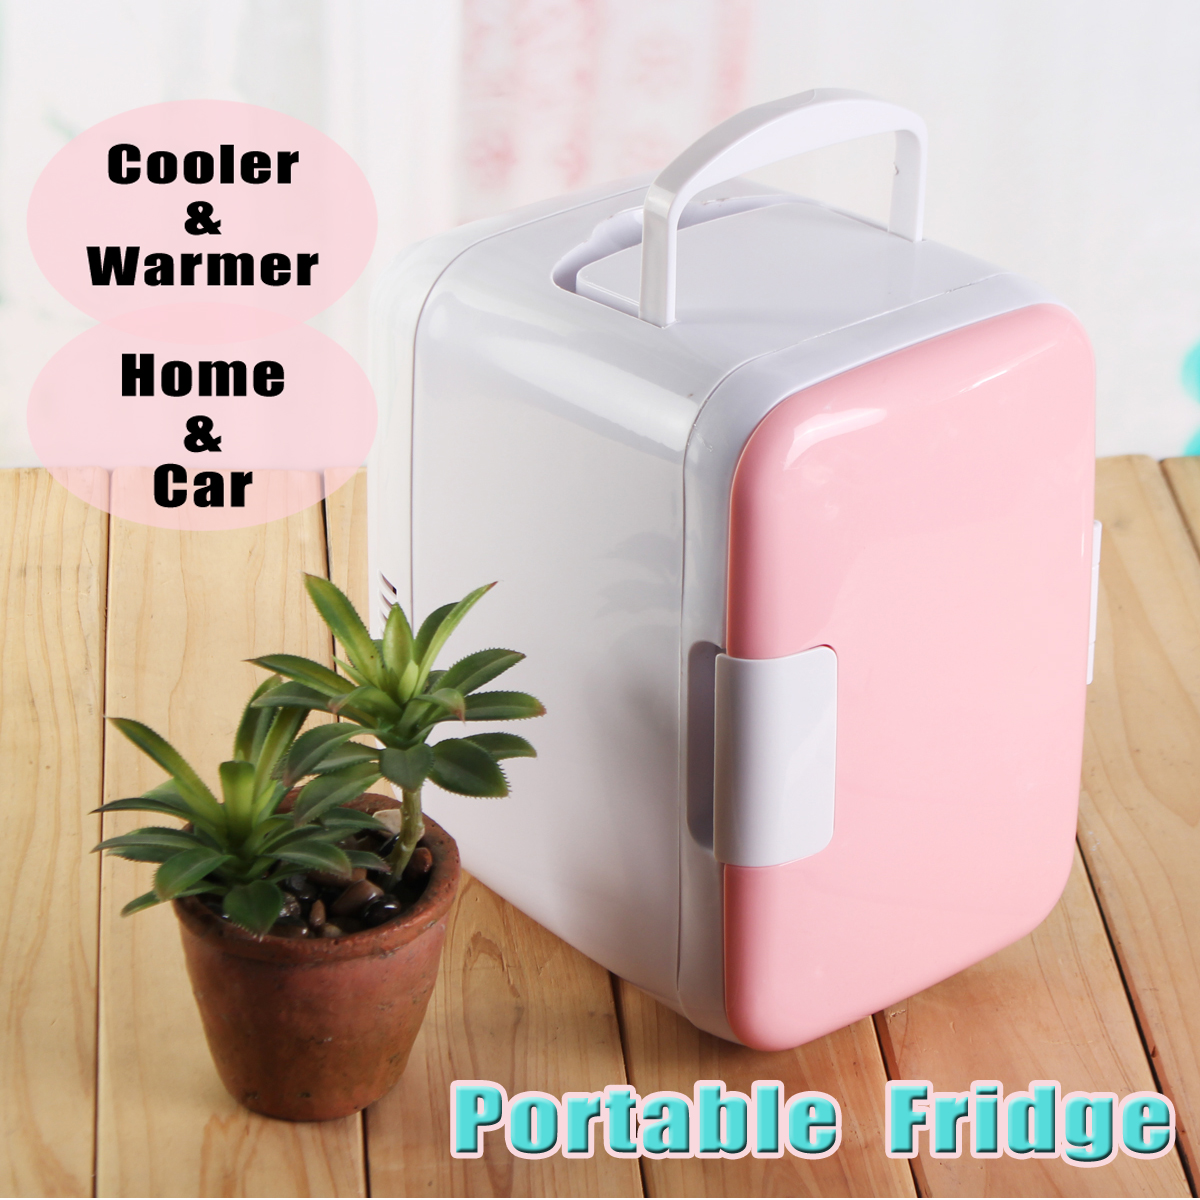 4L Portable Mini Fridge Cooler and Warmer Auto Car Boat Vehicle Refrigerator Home Office AC & DC Pink BS 48W mini 4l portable refrigerator fridge cooler warmer